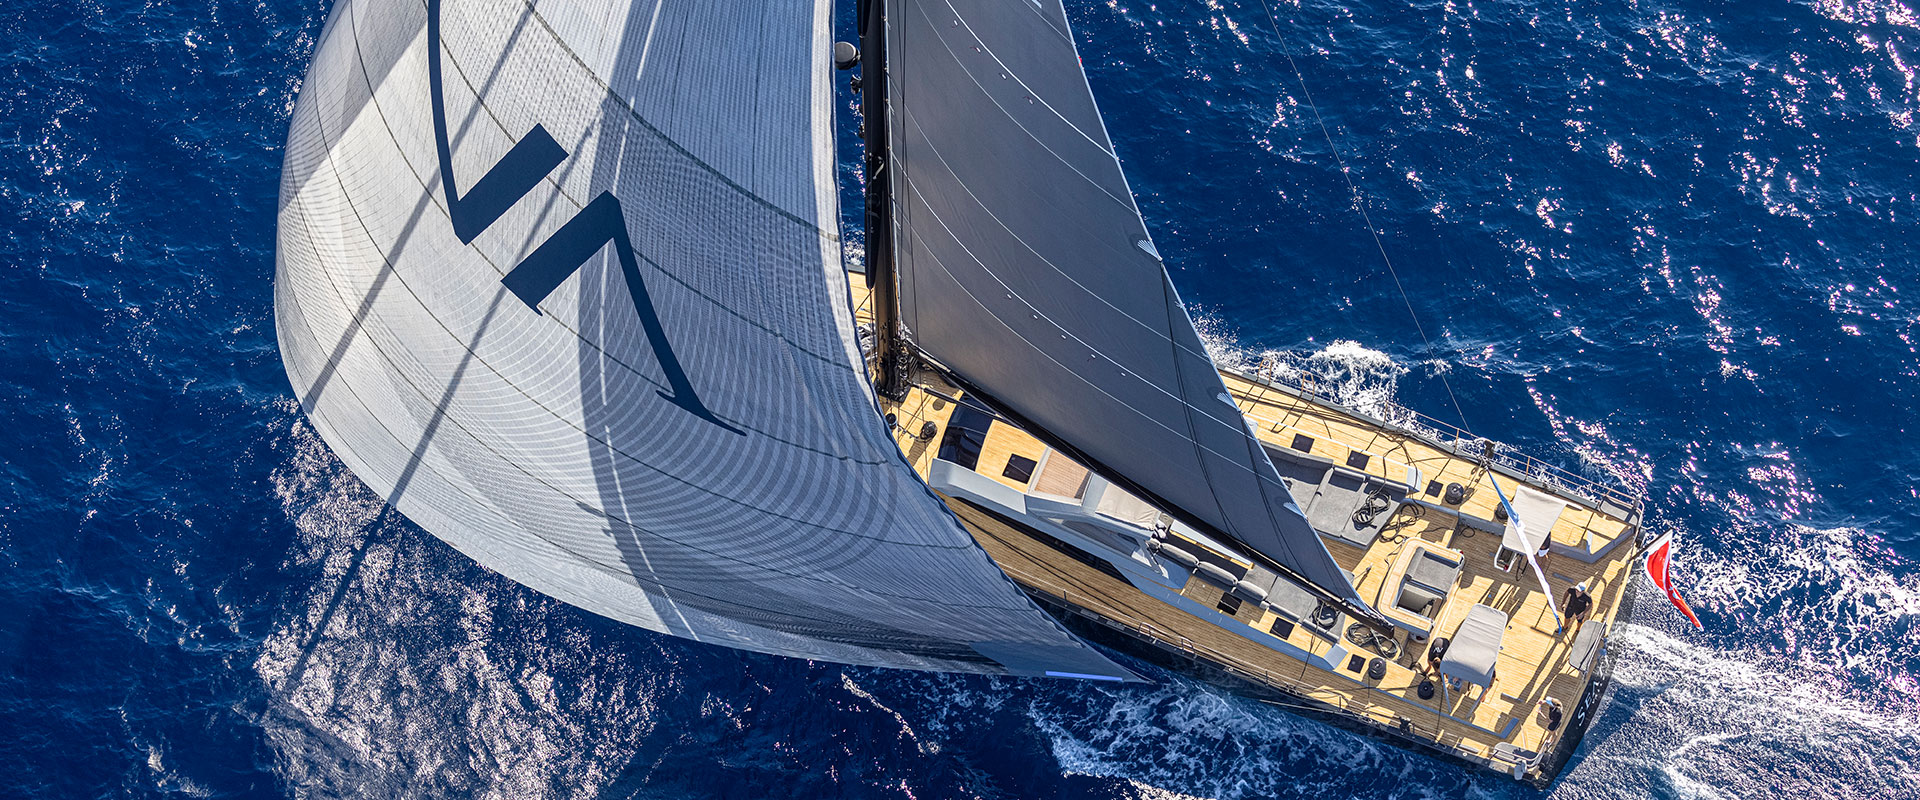 Sw96 Seatius Yacht Award Winning Yacht Southern Wind City mountains dock sail boat yacht